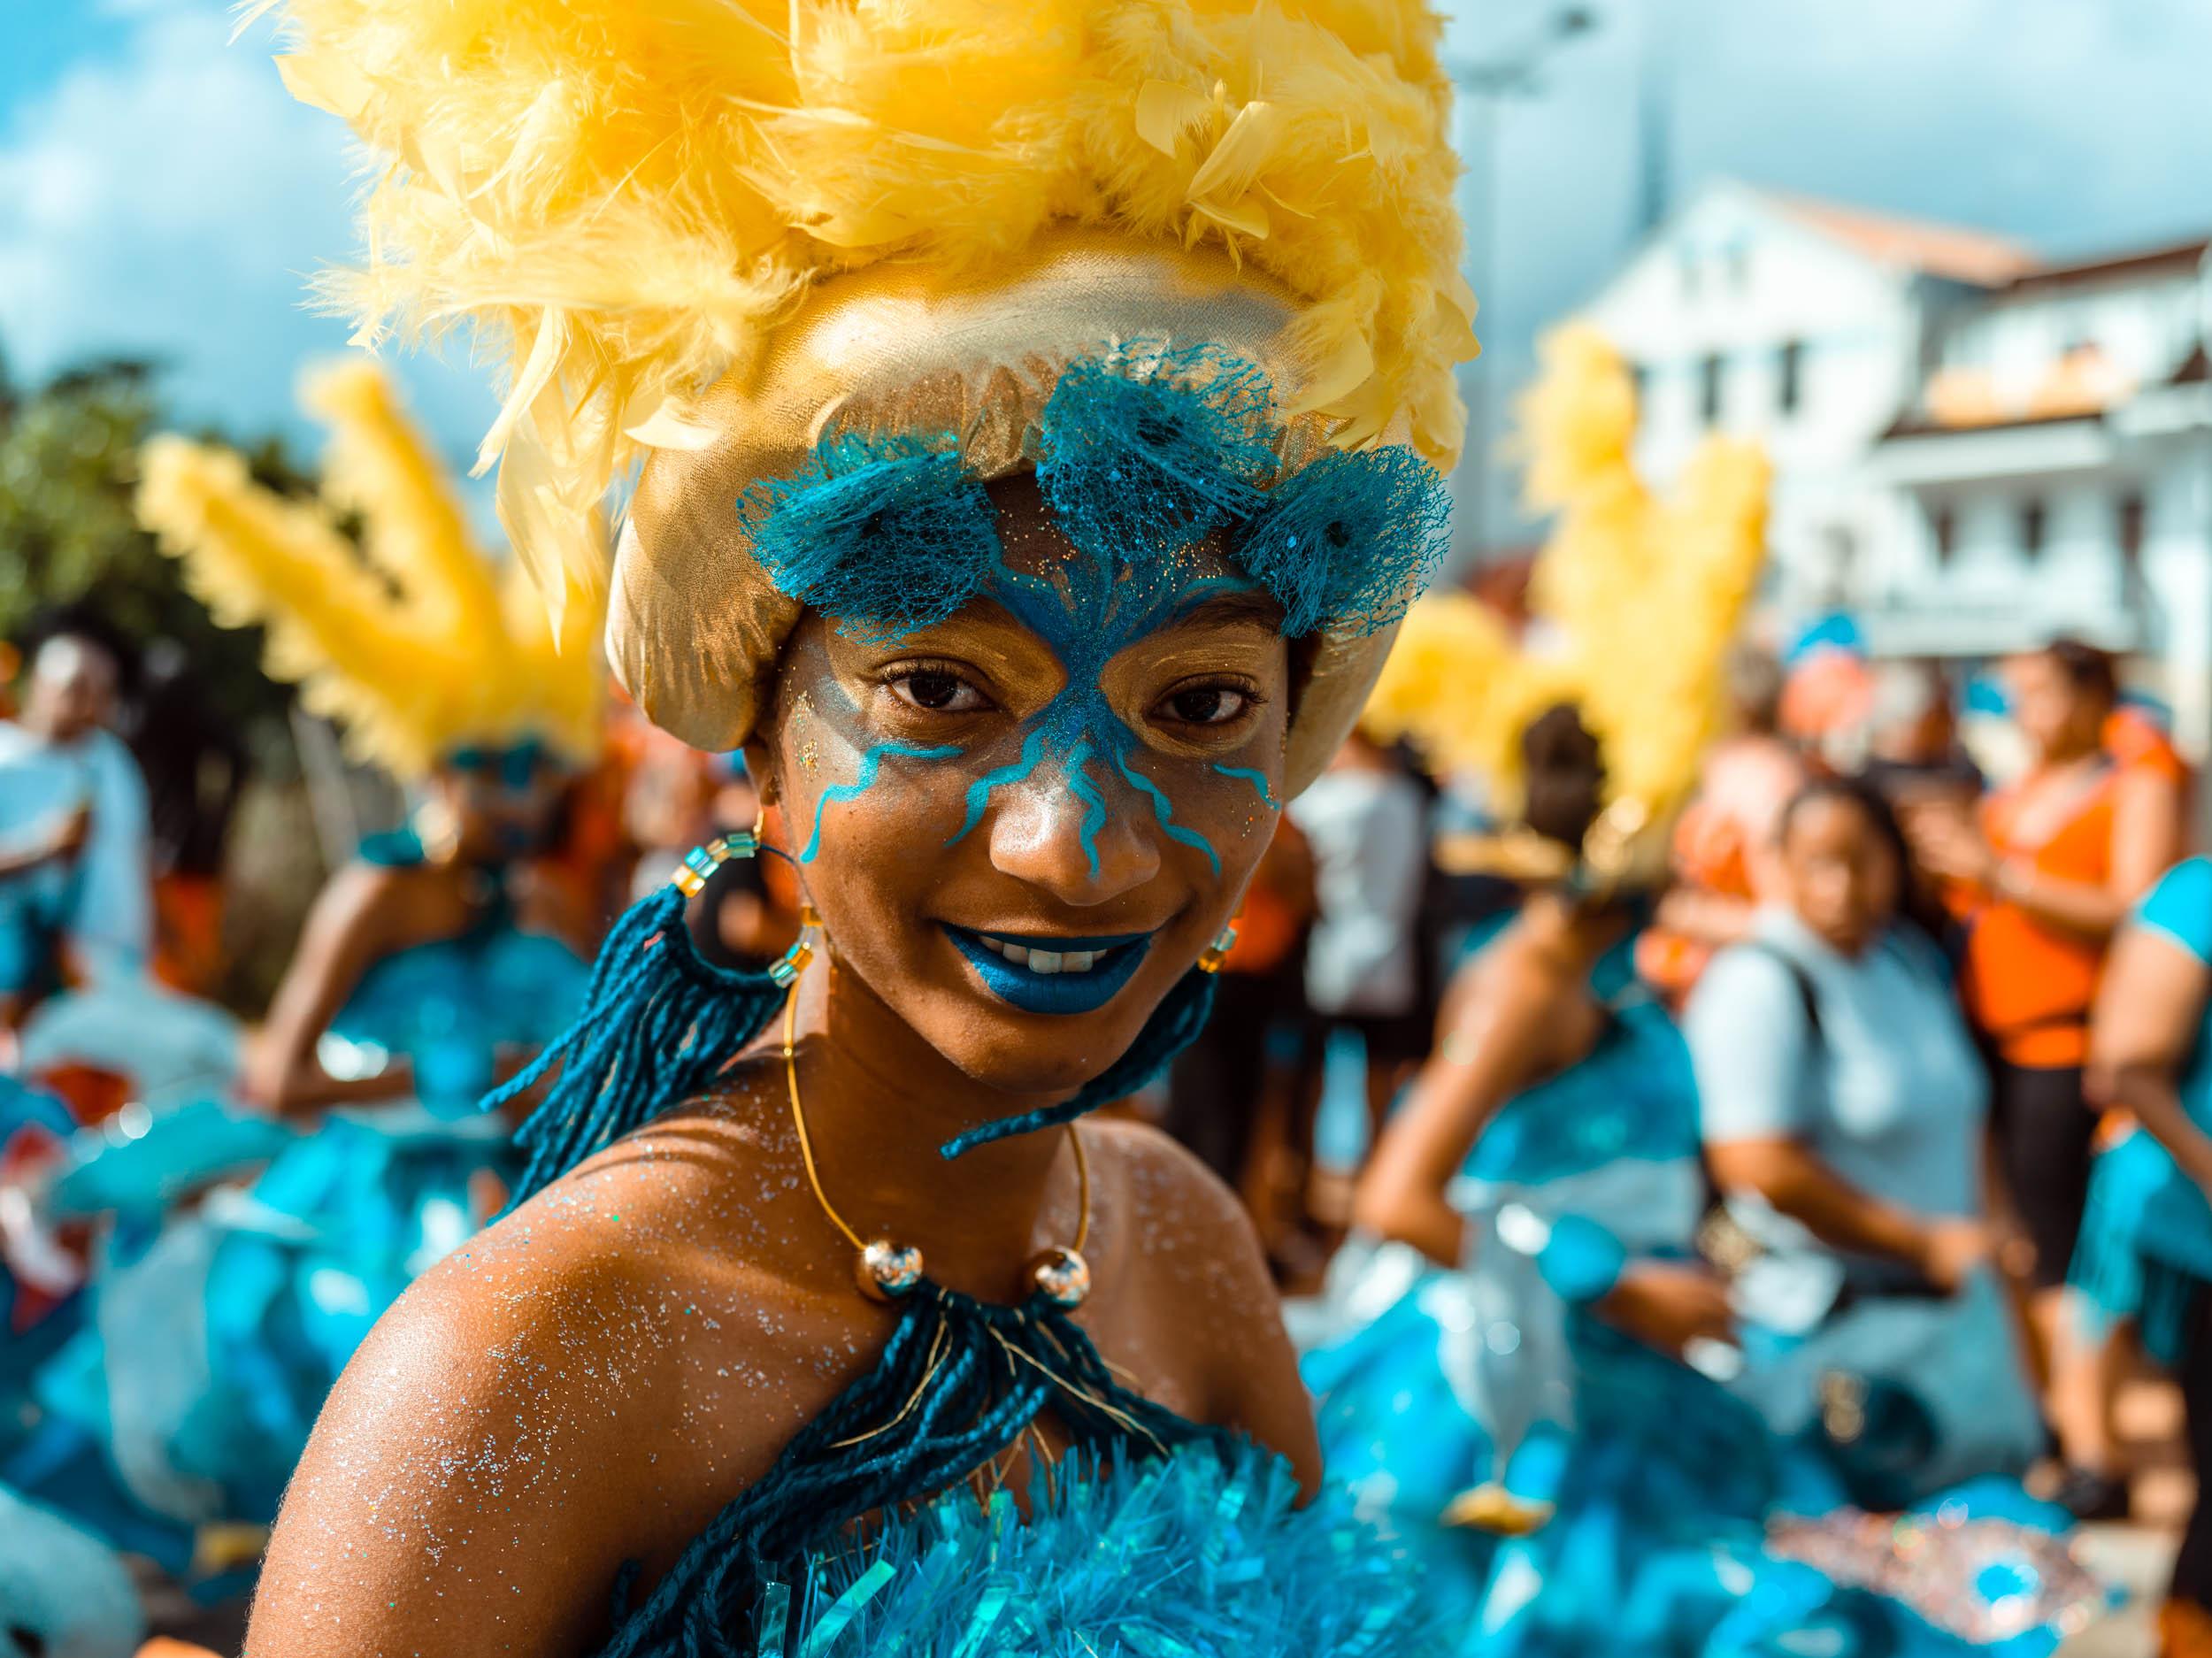 180213_SK_Martinique-29.jpg